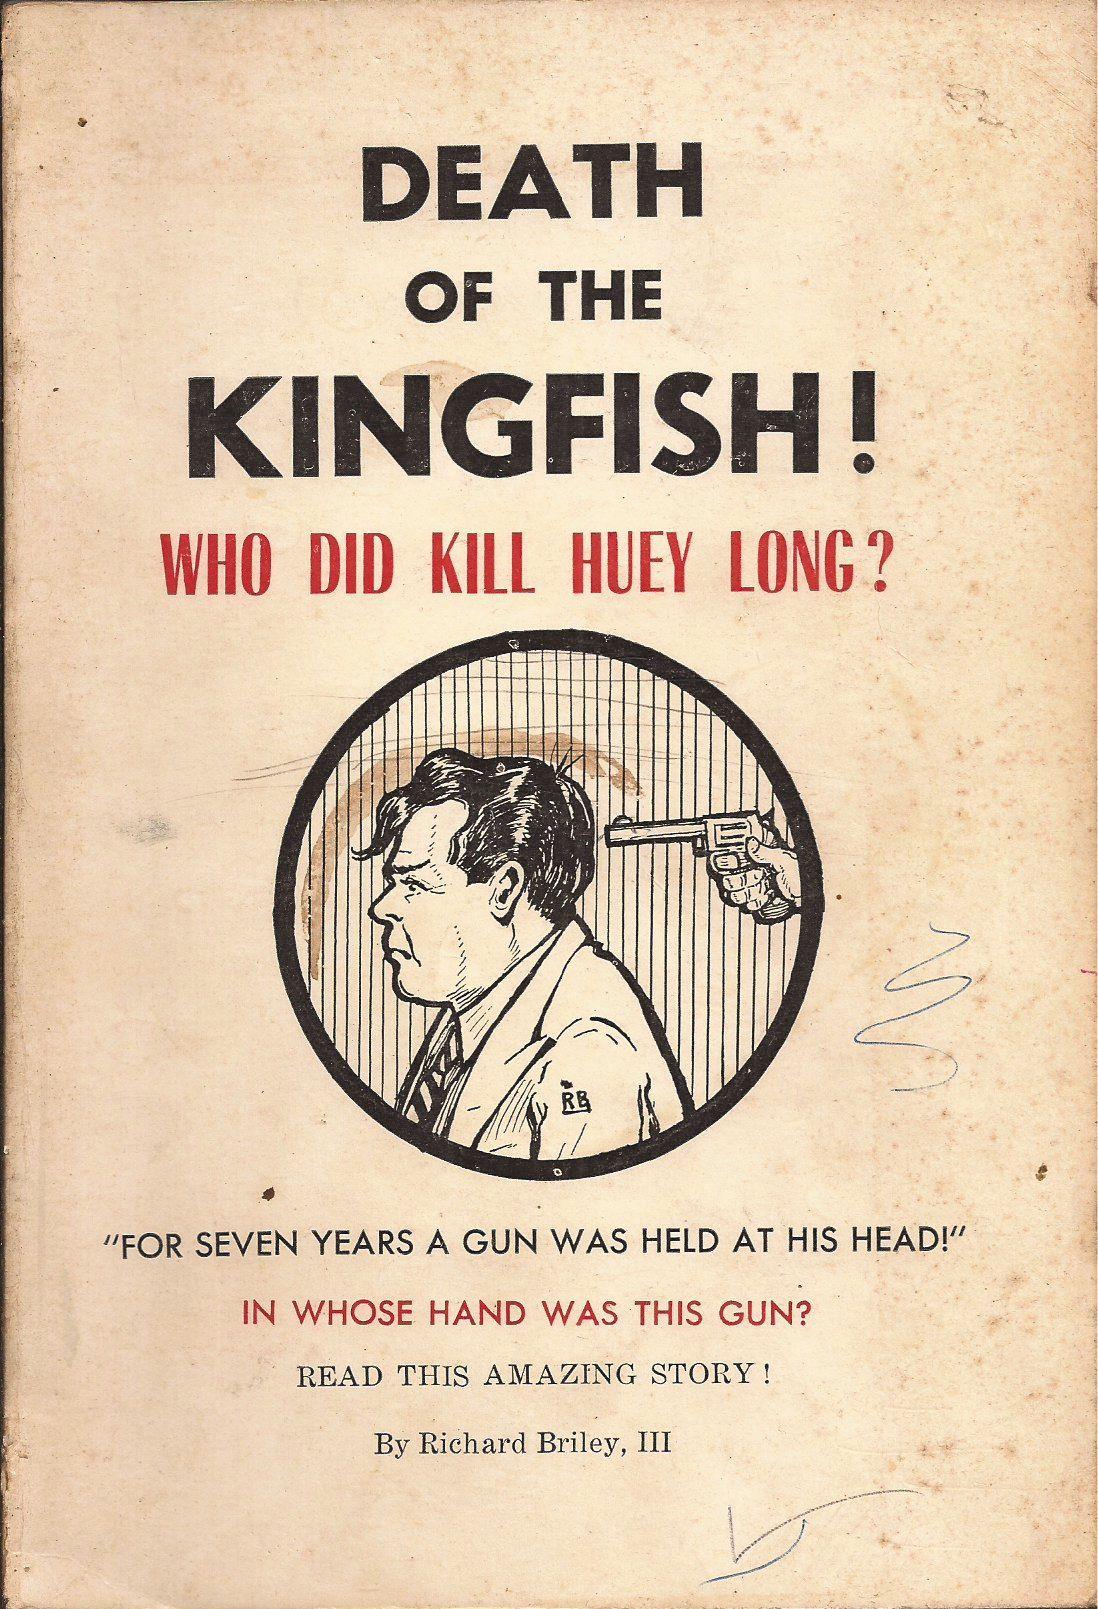 the assasination of huey long Thursday, 29 november 2012 the assasination of huey long.